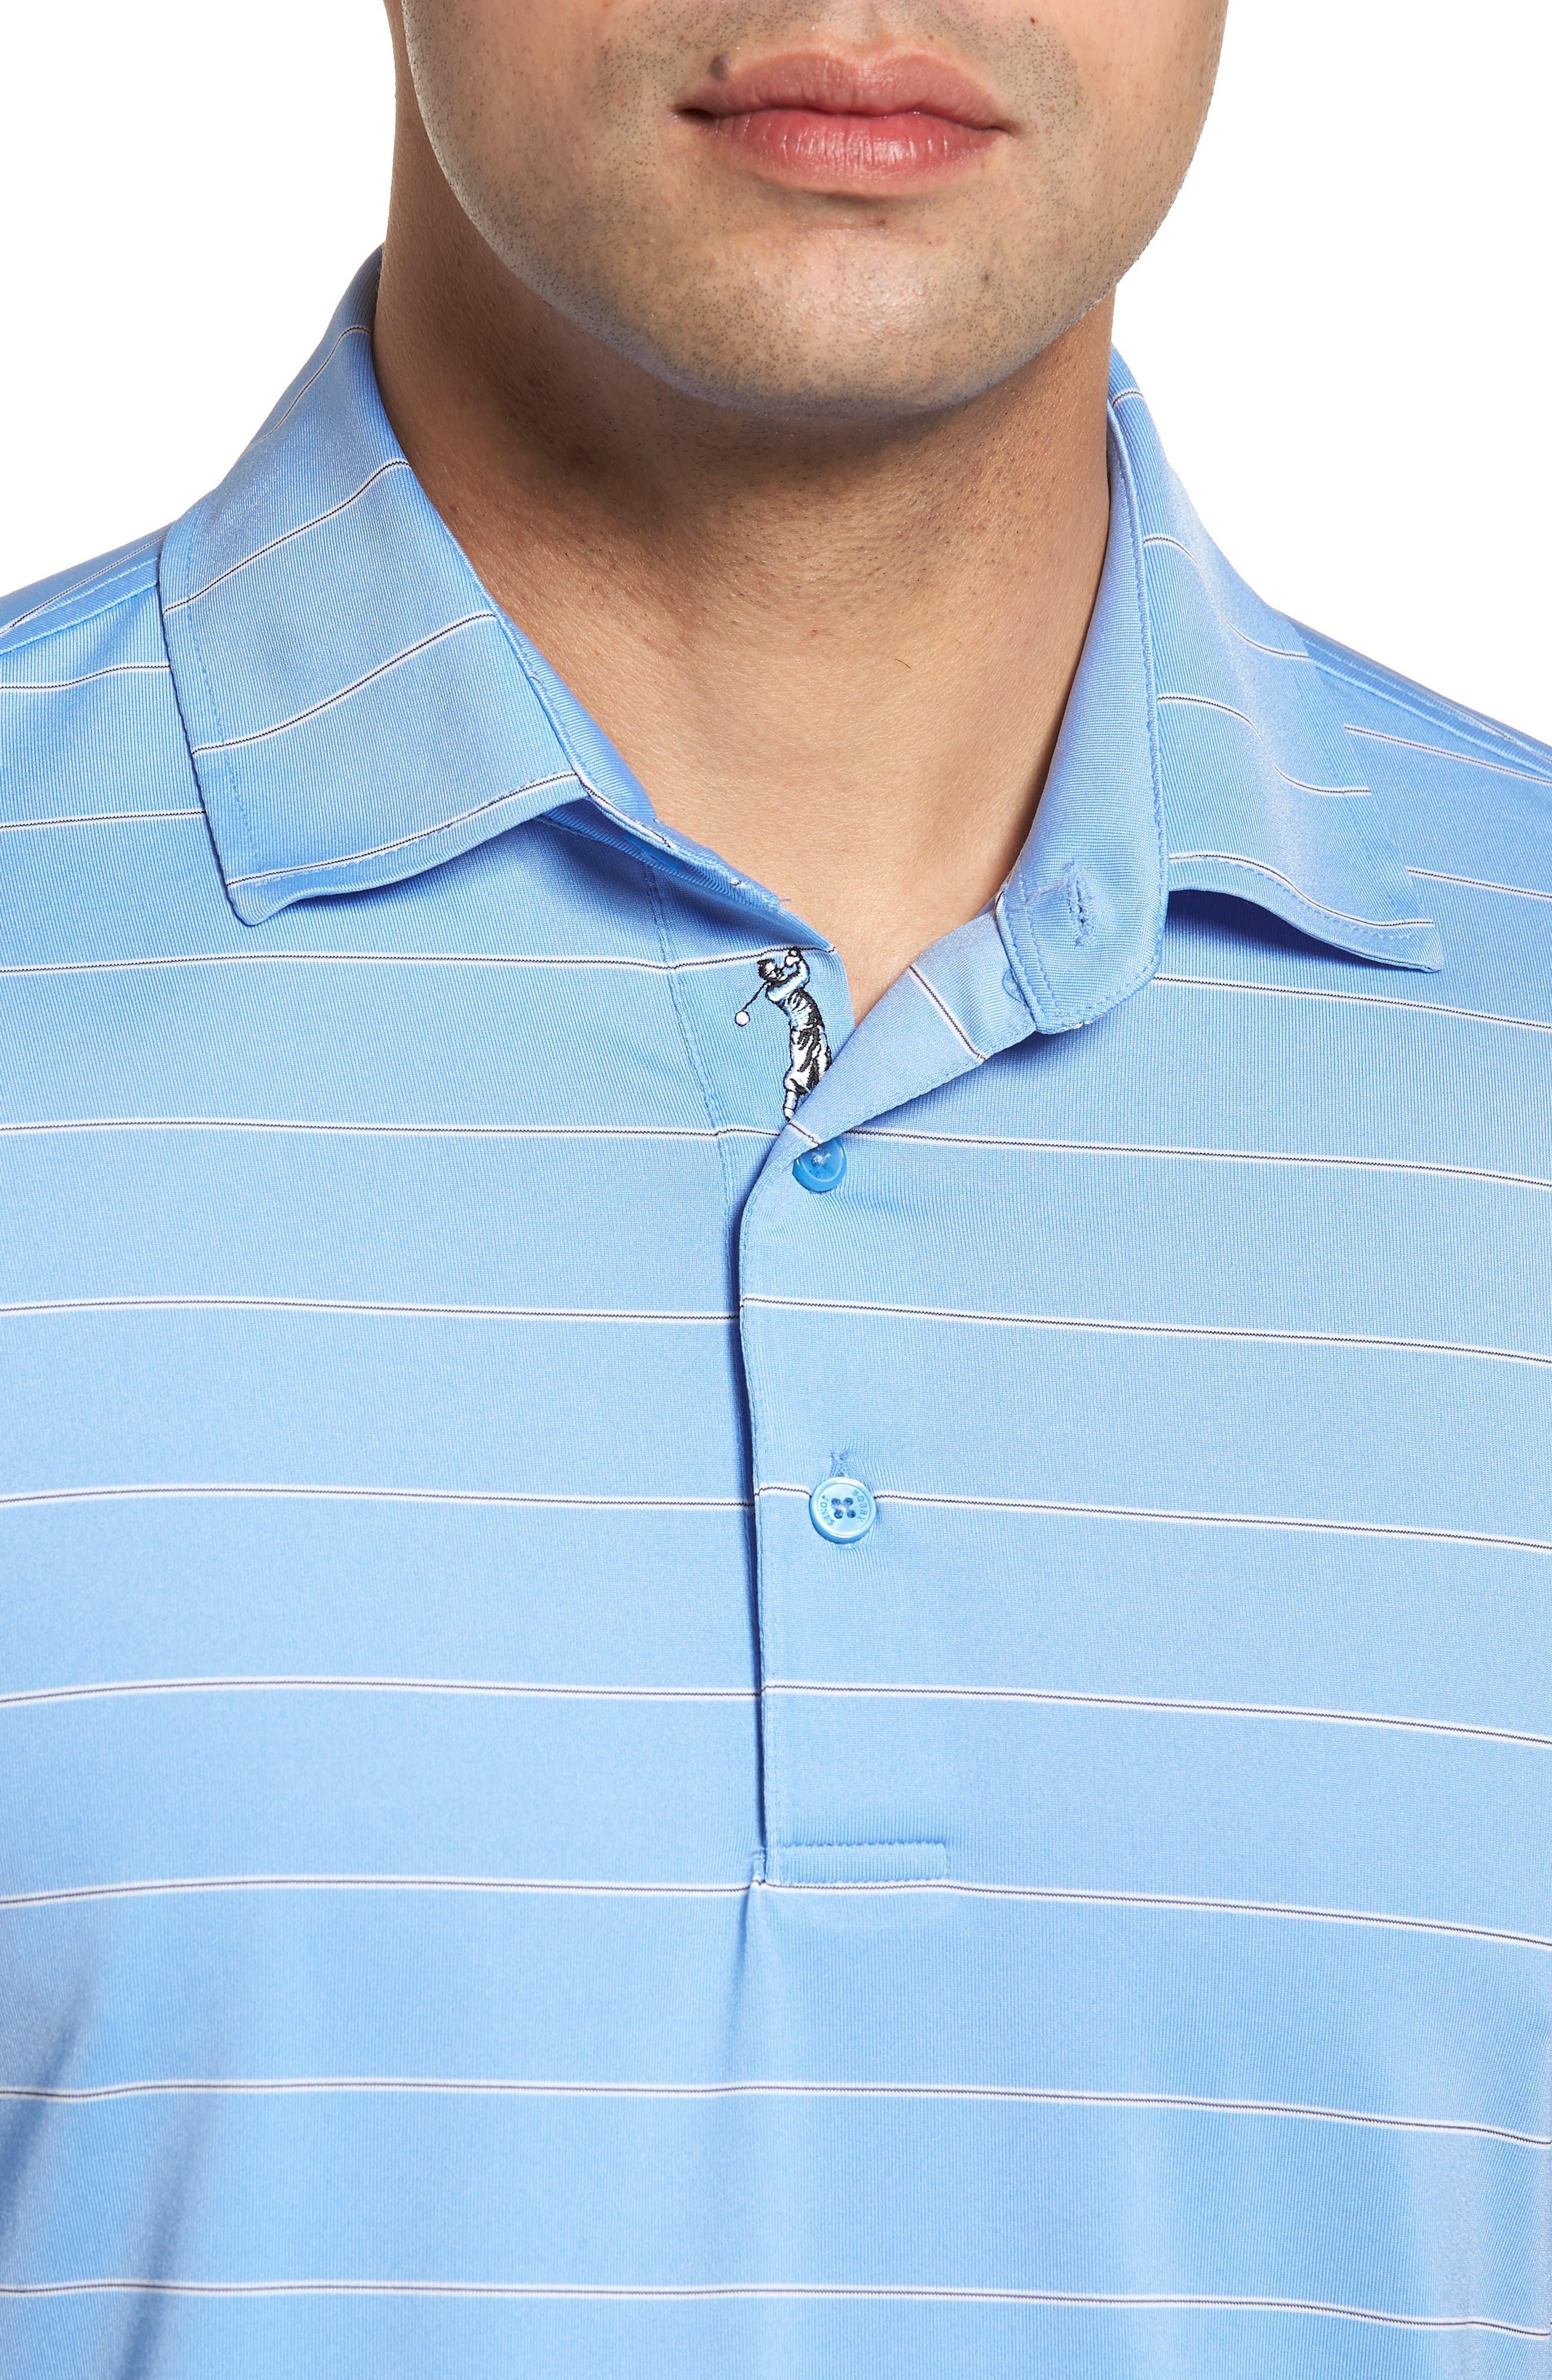 XH2O Momentum Stripe Jersey Polo,                             Alternate thumbnail 4, color,                             459